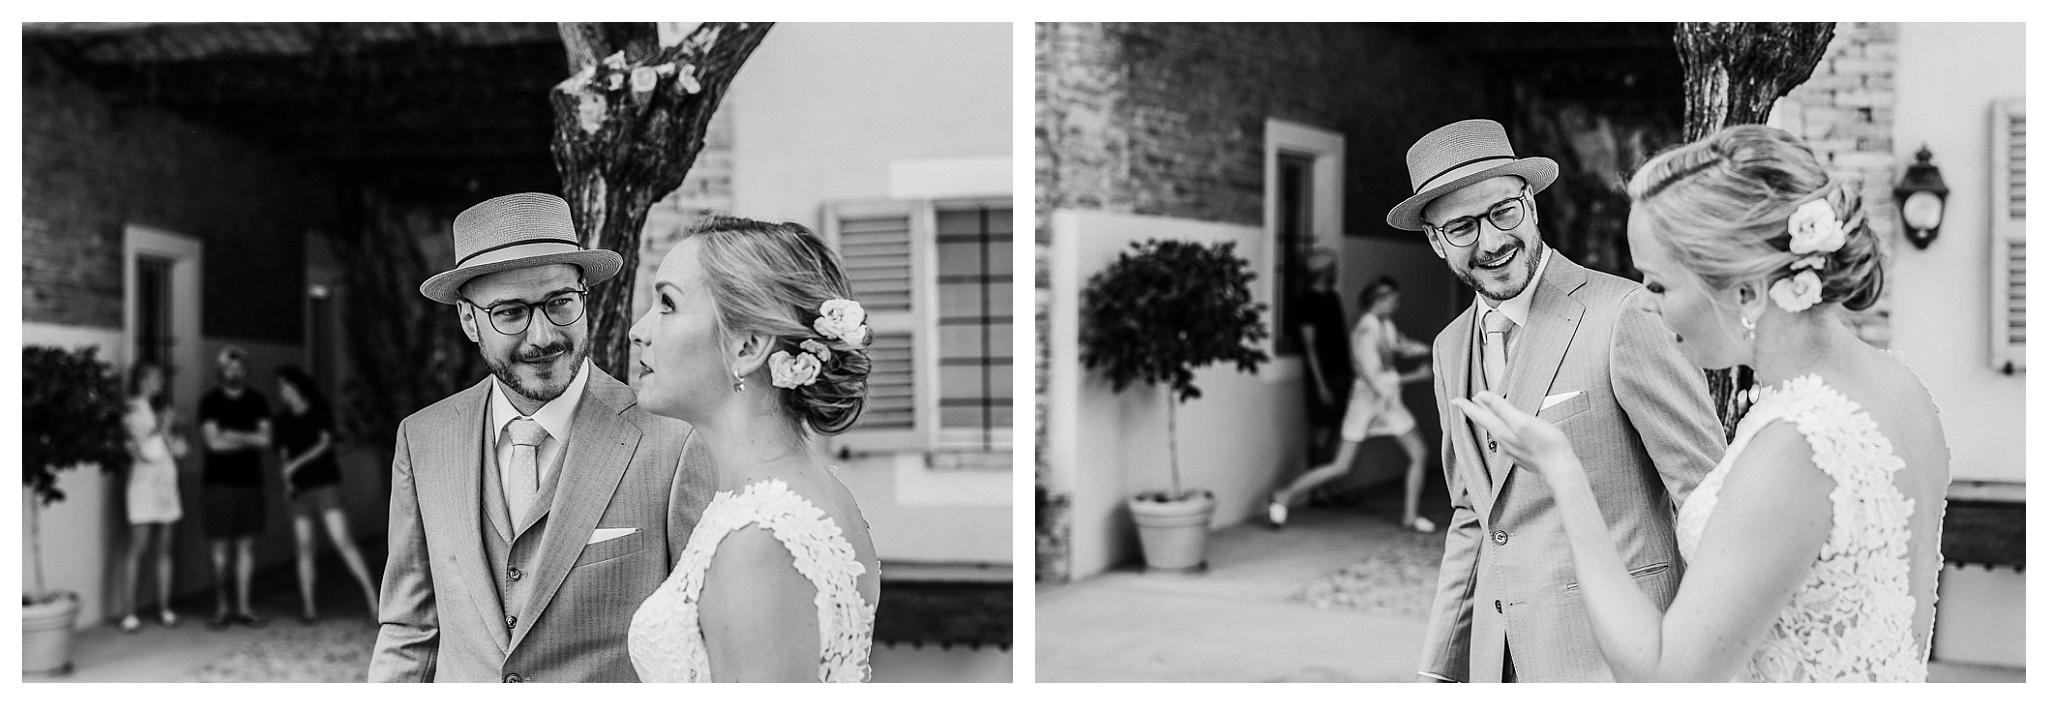 Bride and groom make ready for their wedding ceremony at La Villa Hotel, Mombaruzzo